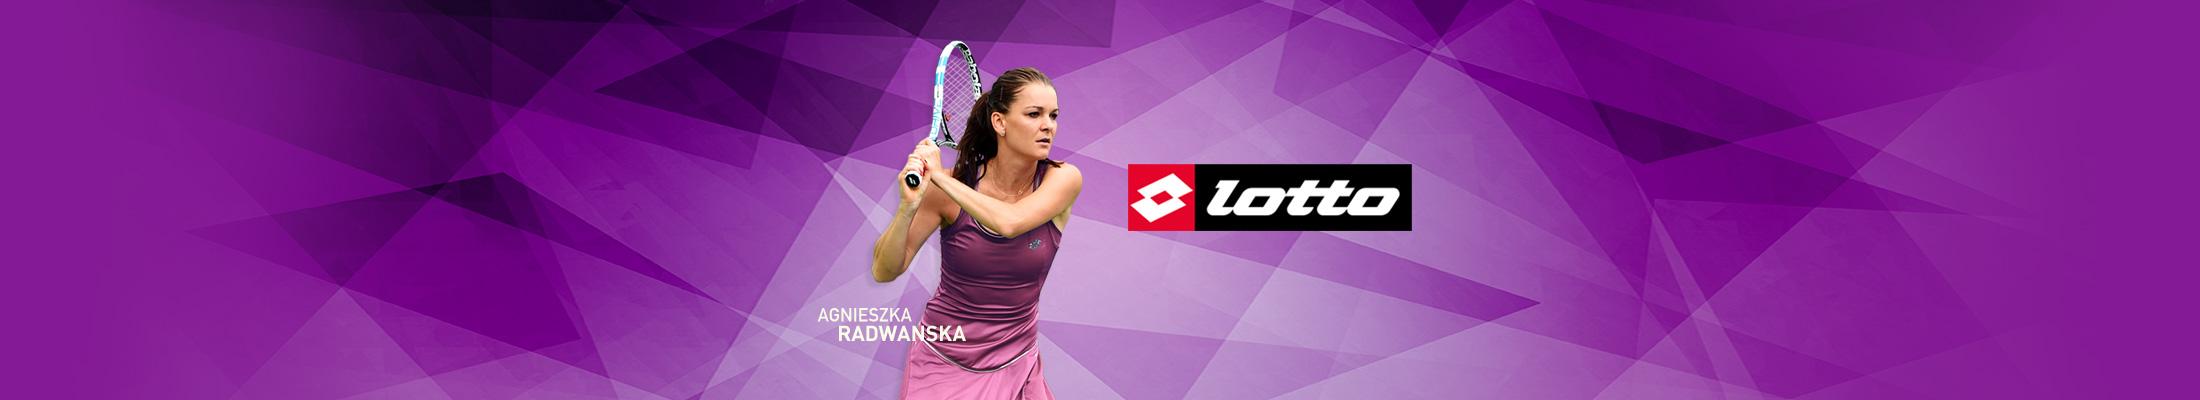 Women's Tennis apparel Lotto